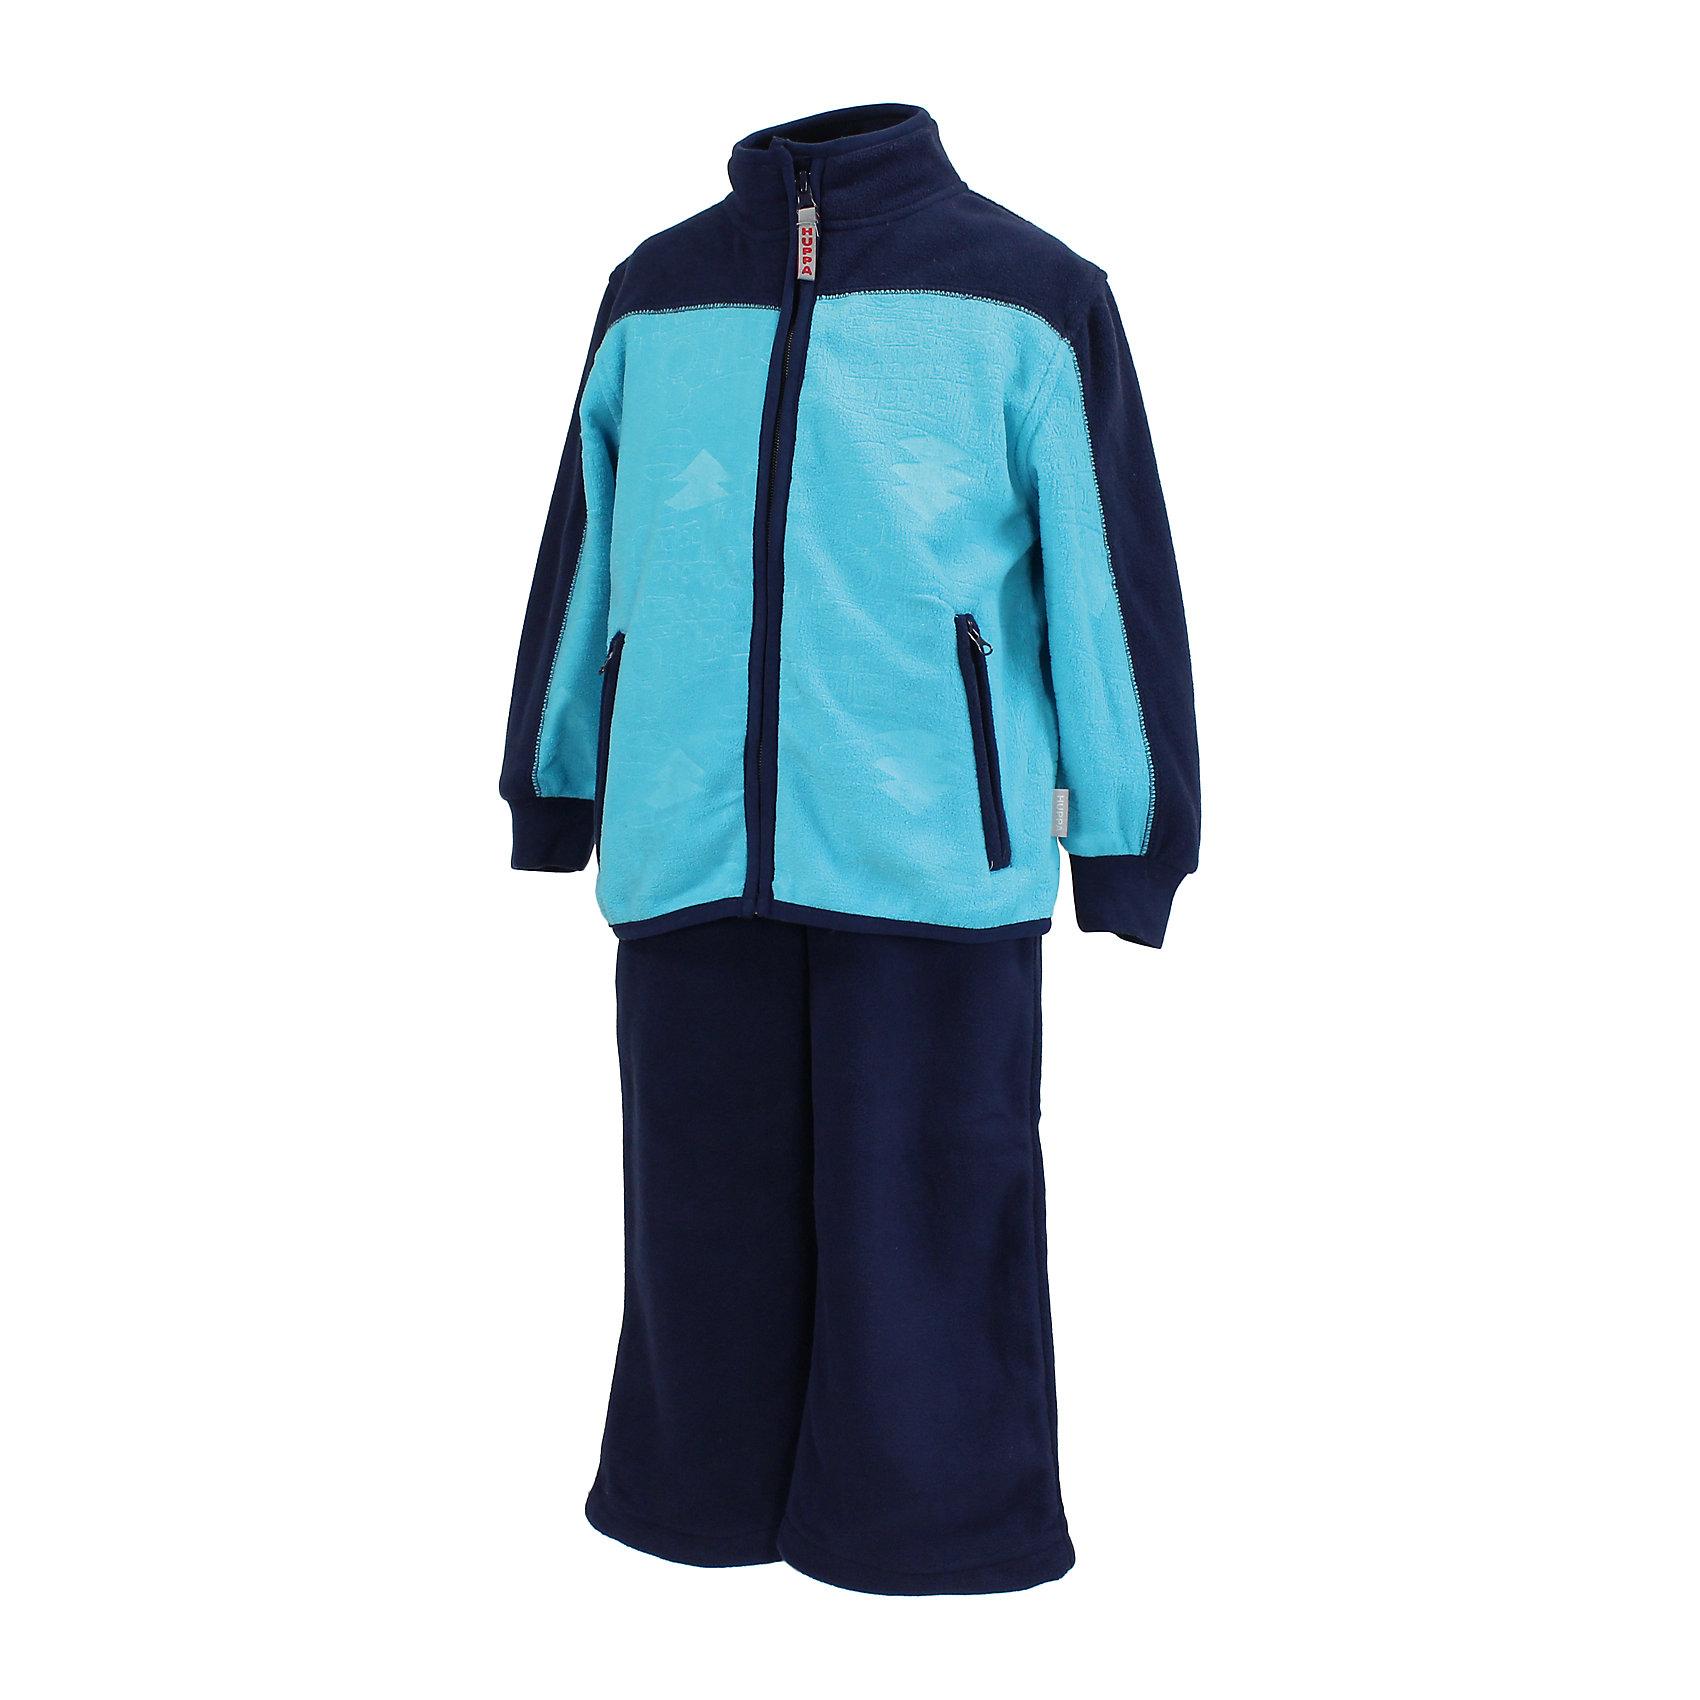 Комплект для мальчика: куртка и брюки Huppa